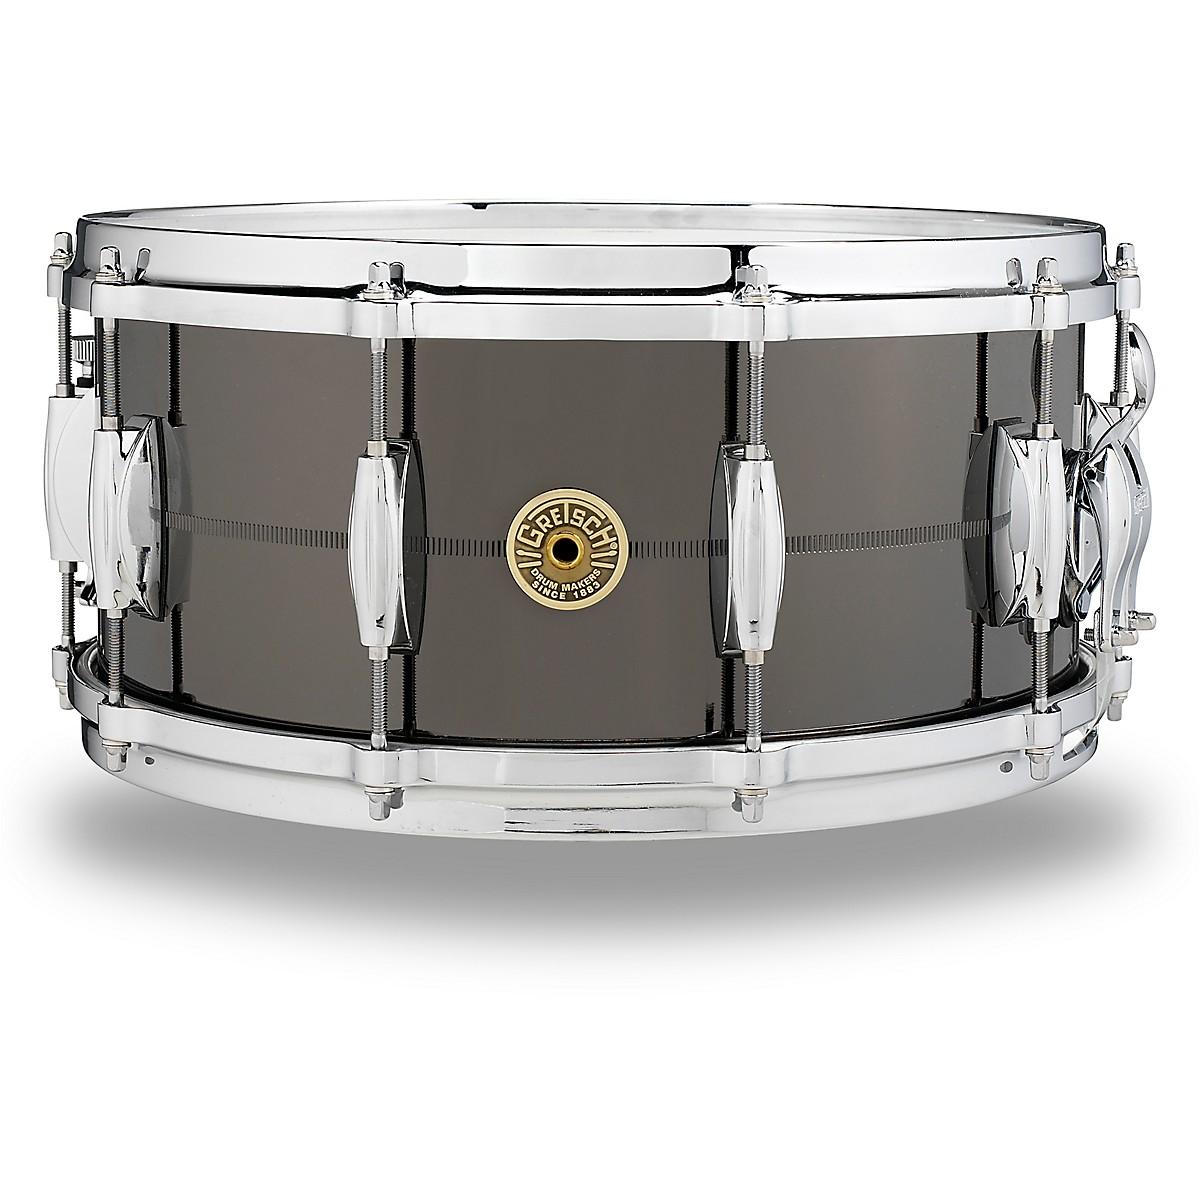 Gretsch Drums USA Solid Steel Snare Drum